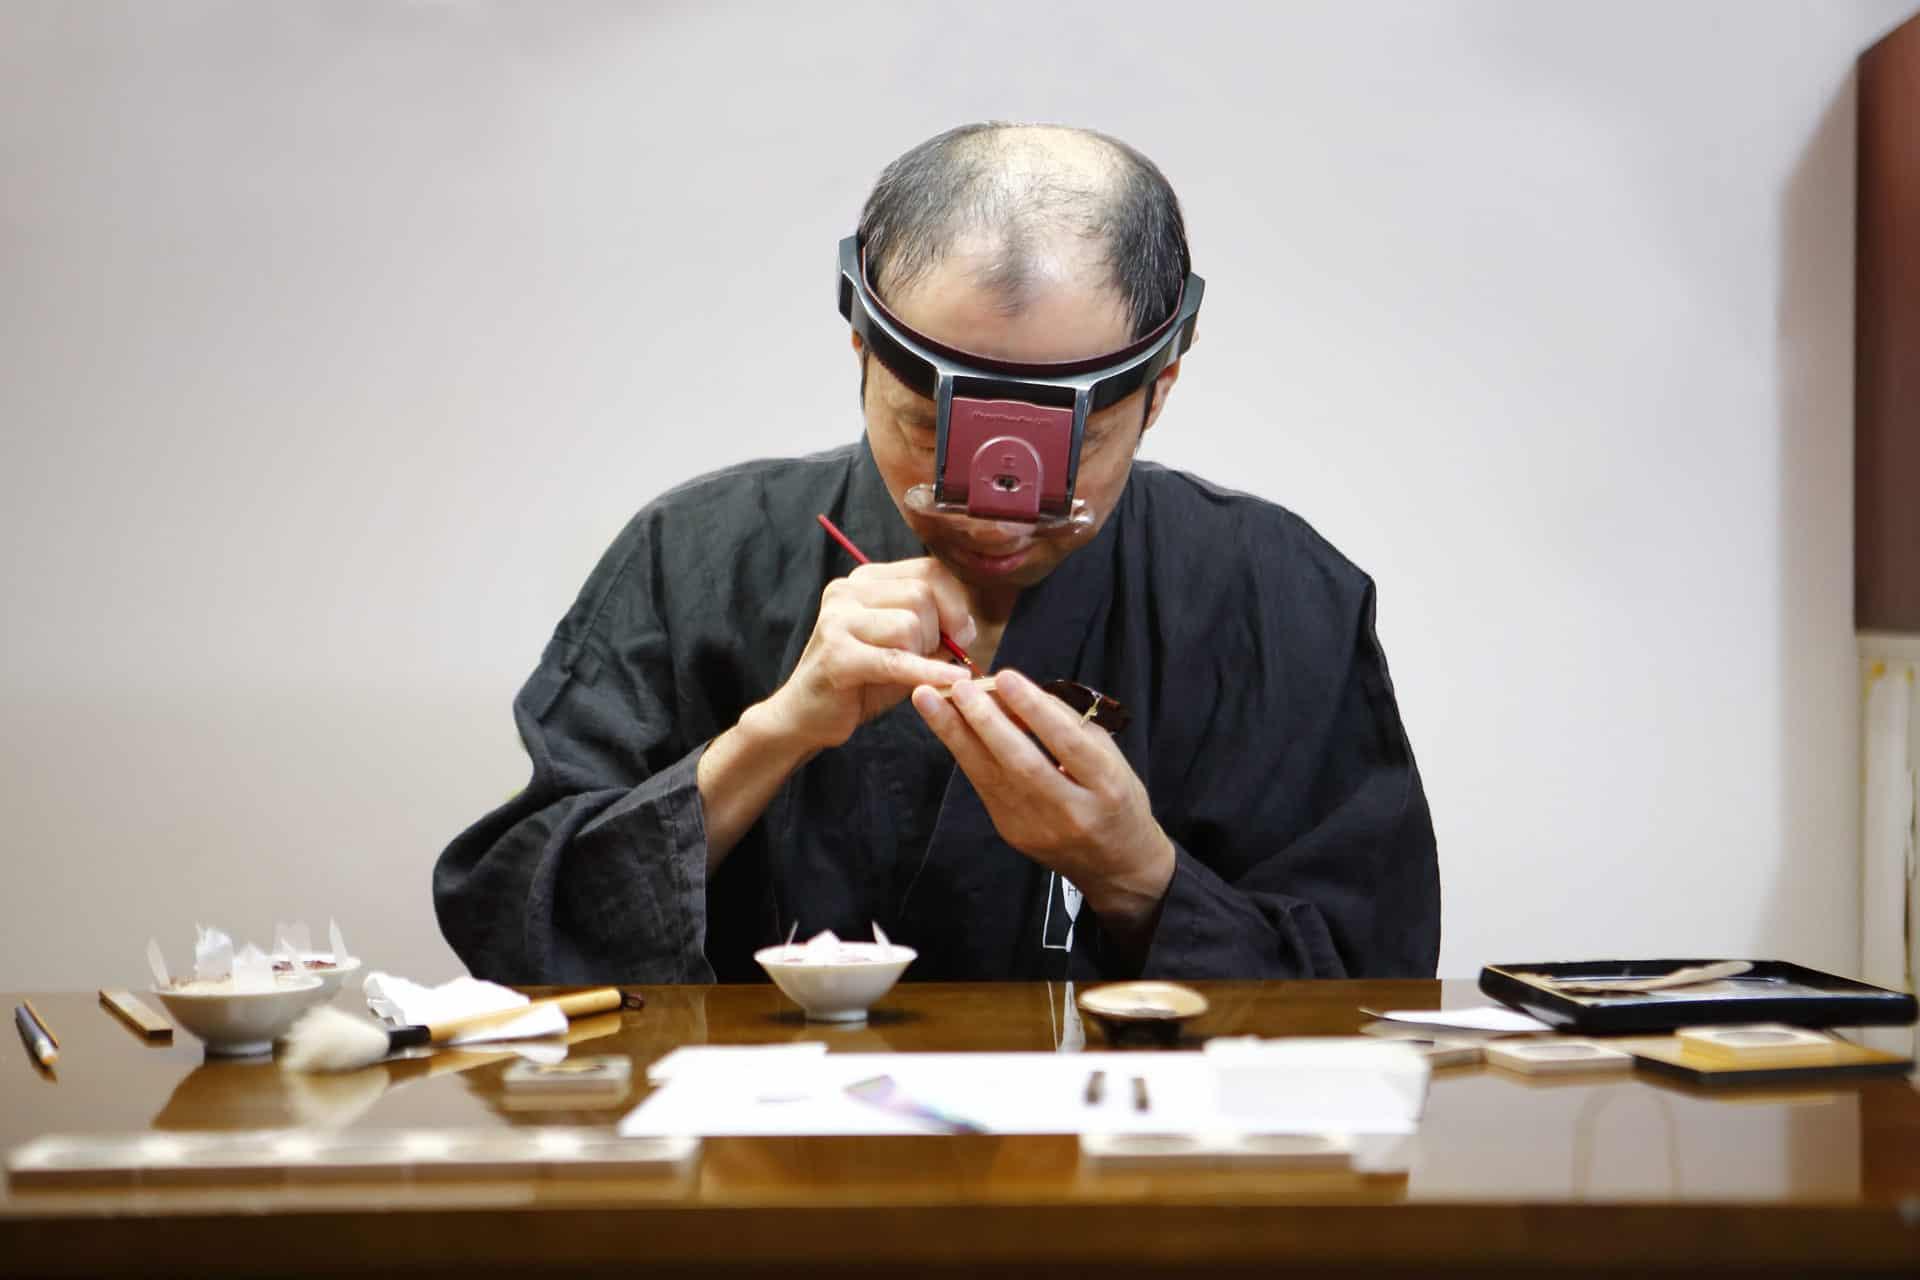 005 - Lacquer painting by Master Minori Koizumi